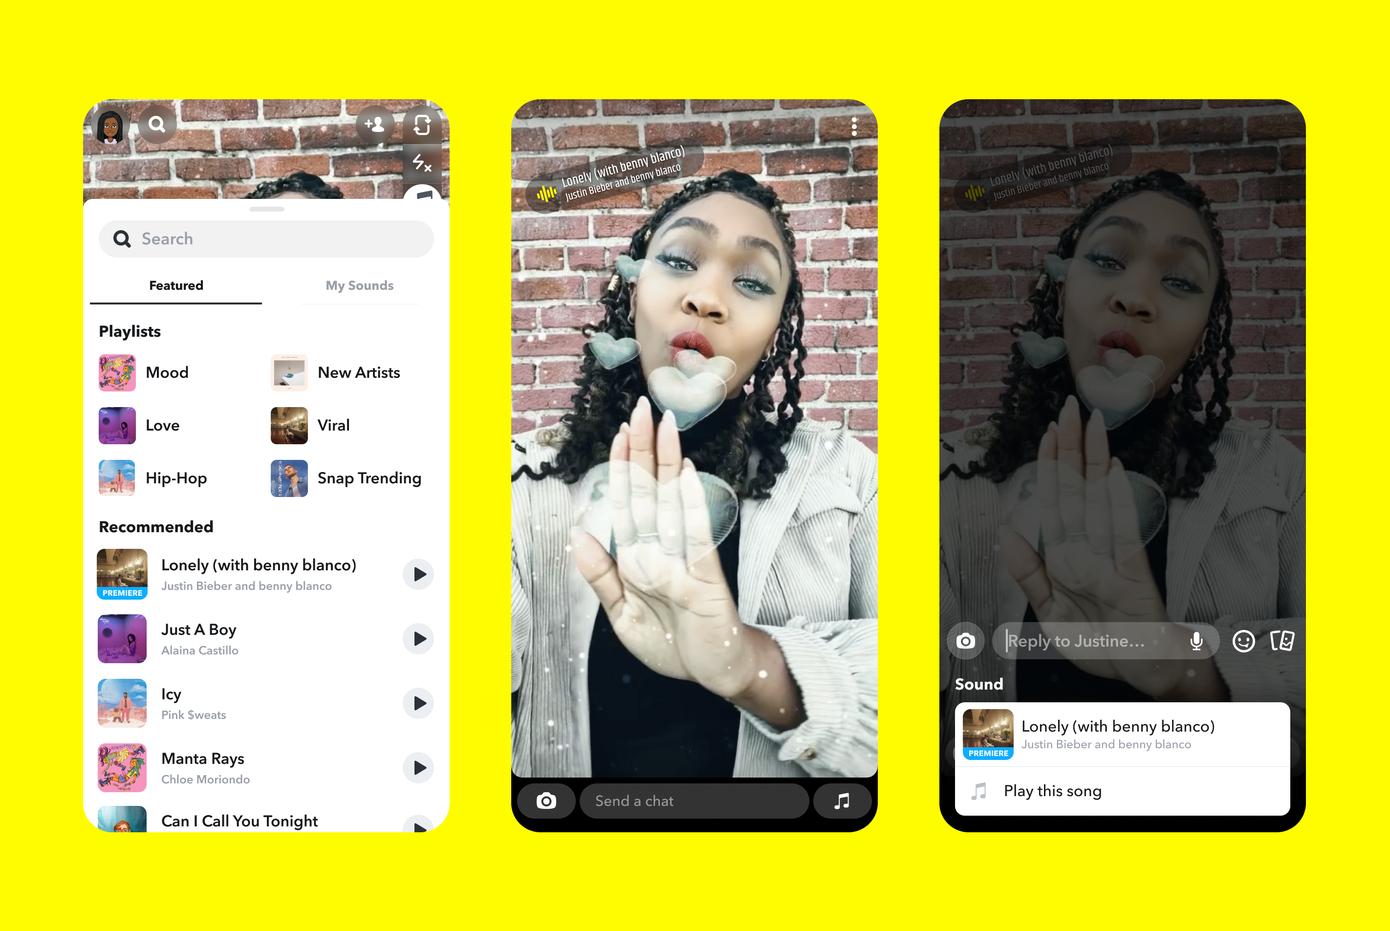 Snap透露与环球音乐集团合作,推动AR平台主流化